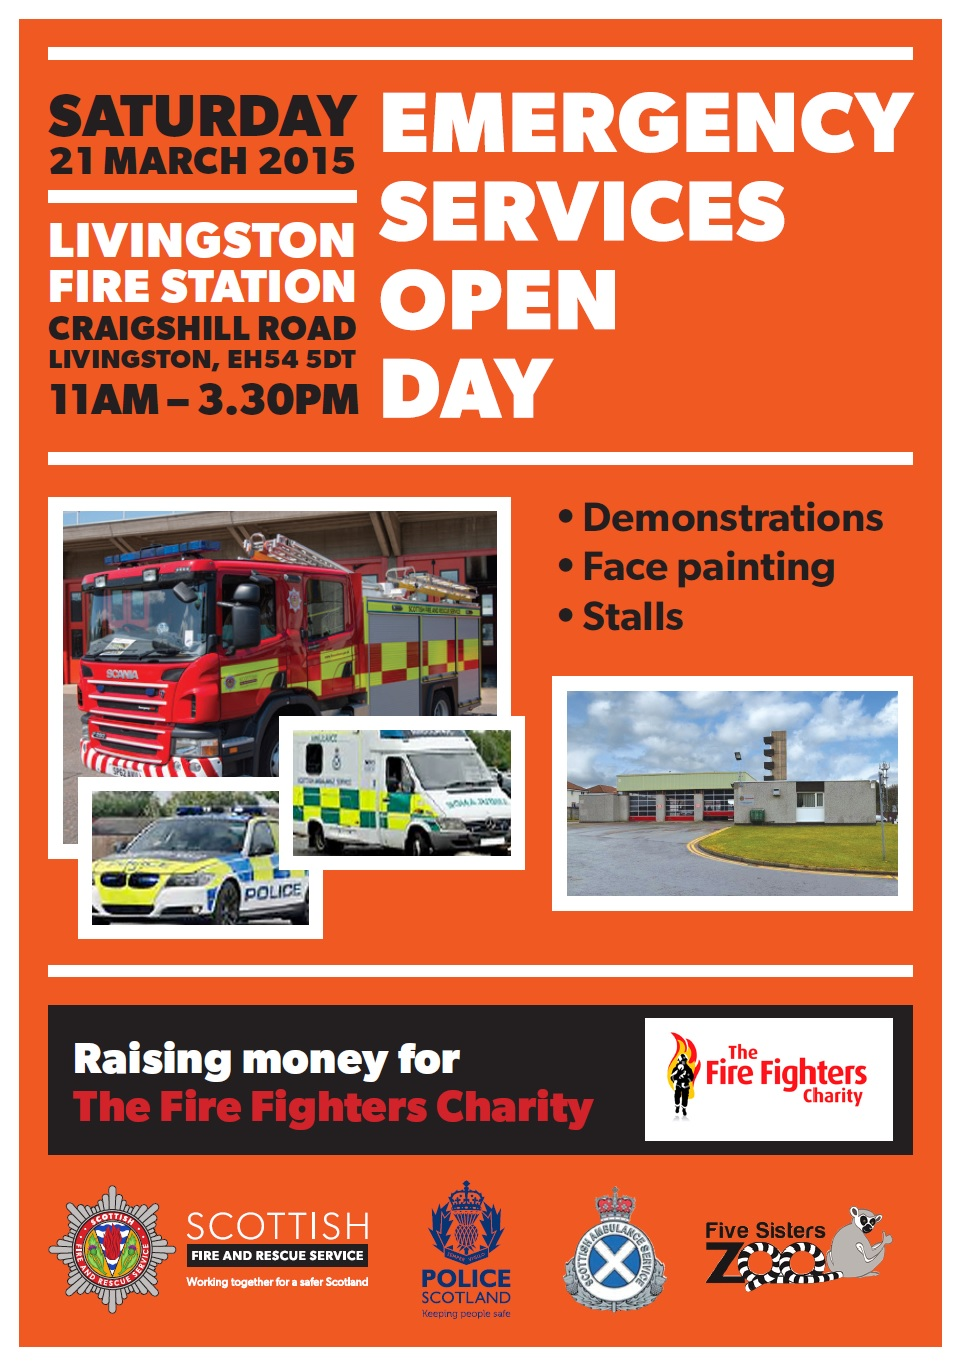 Livingston fire station Open Day